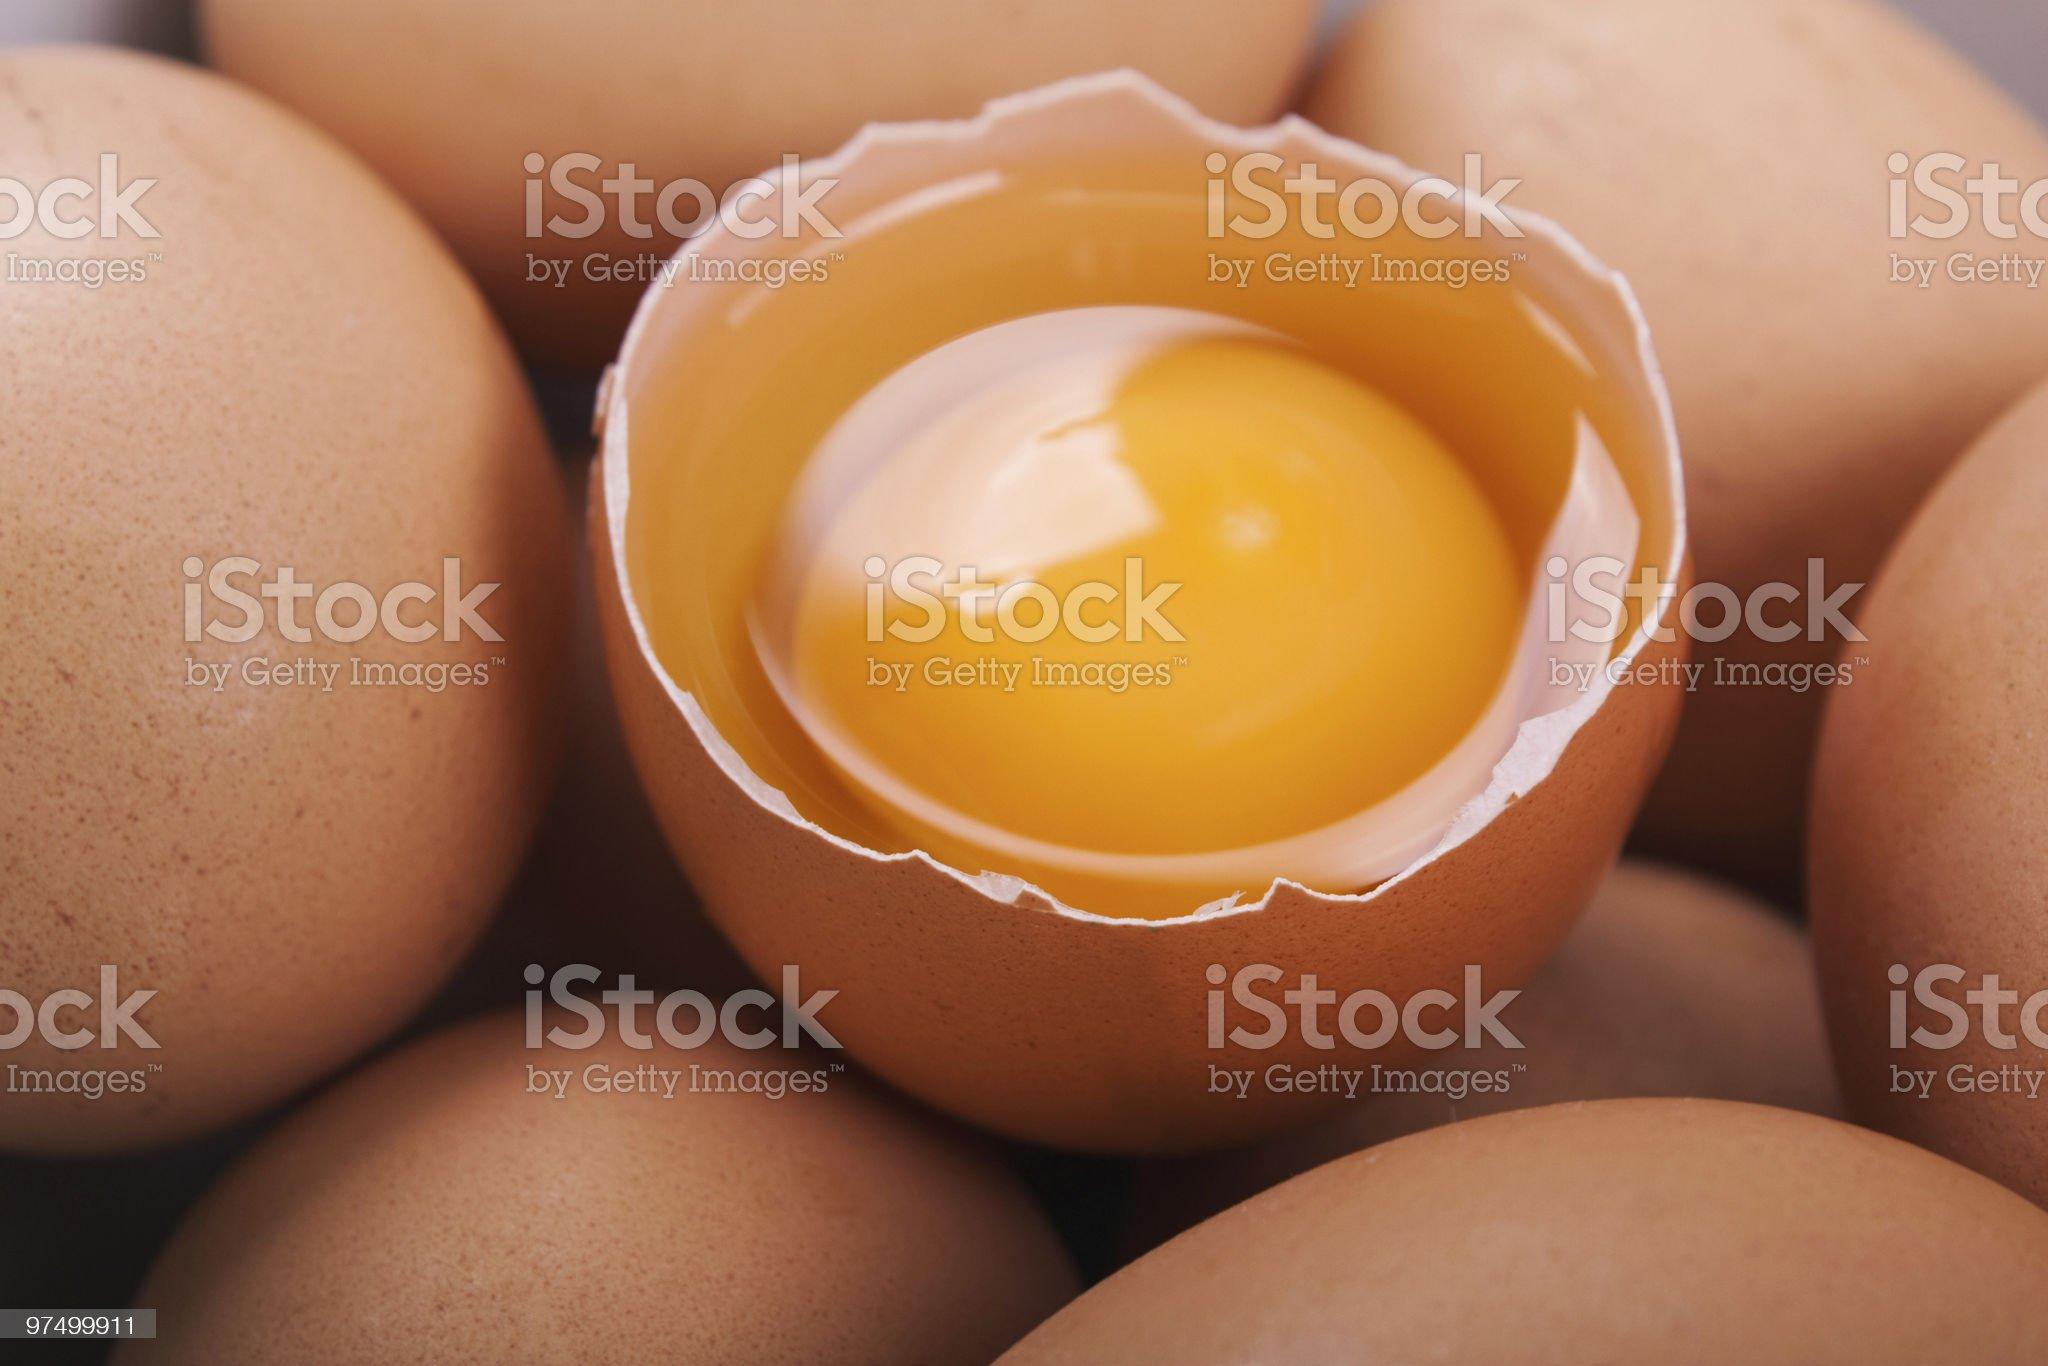 Egg food royalty-free stock photo